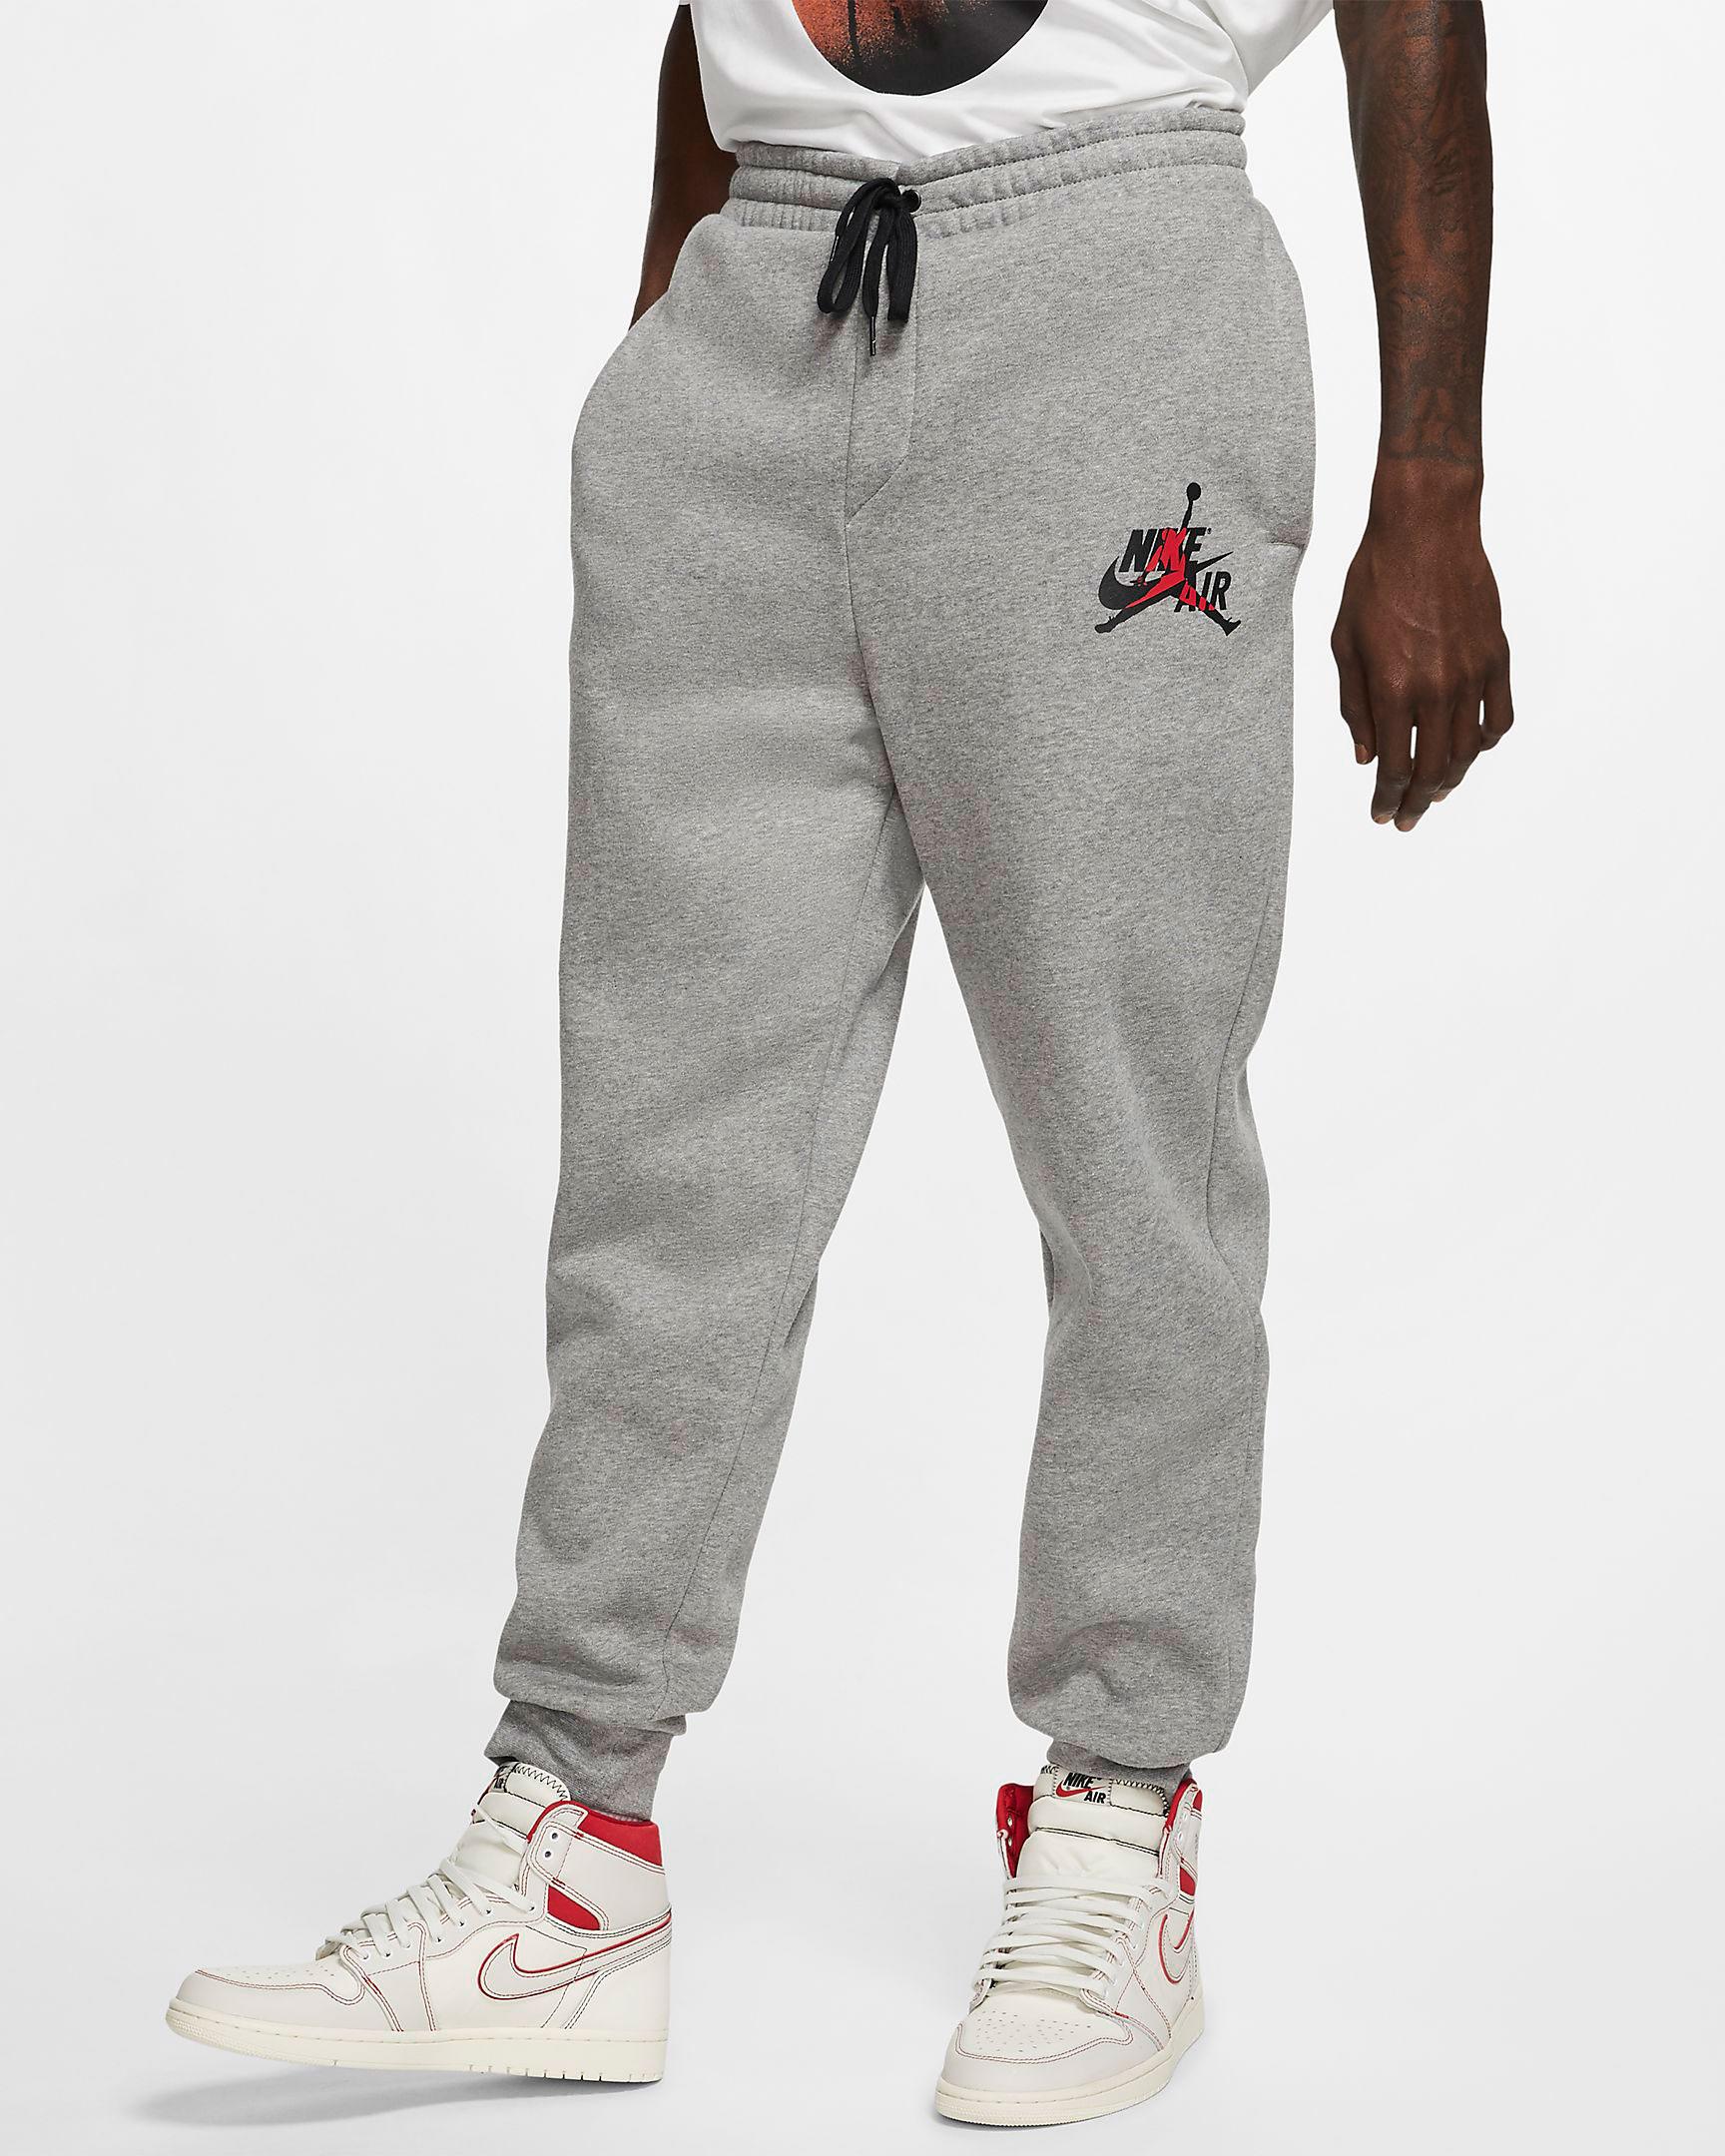 air-jordan-1-high-gym-red-jogger-pants-1